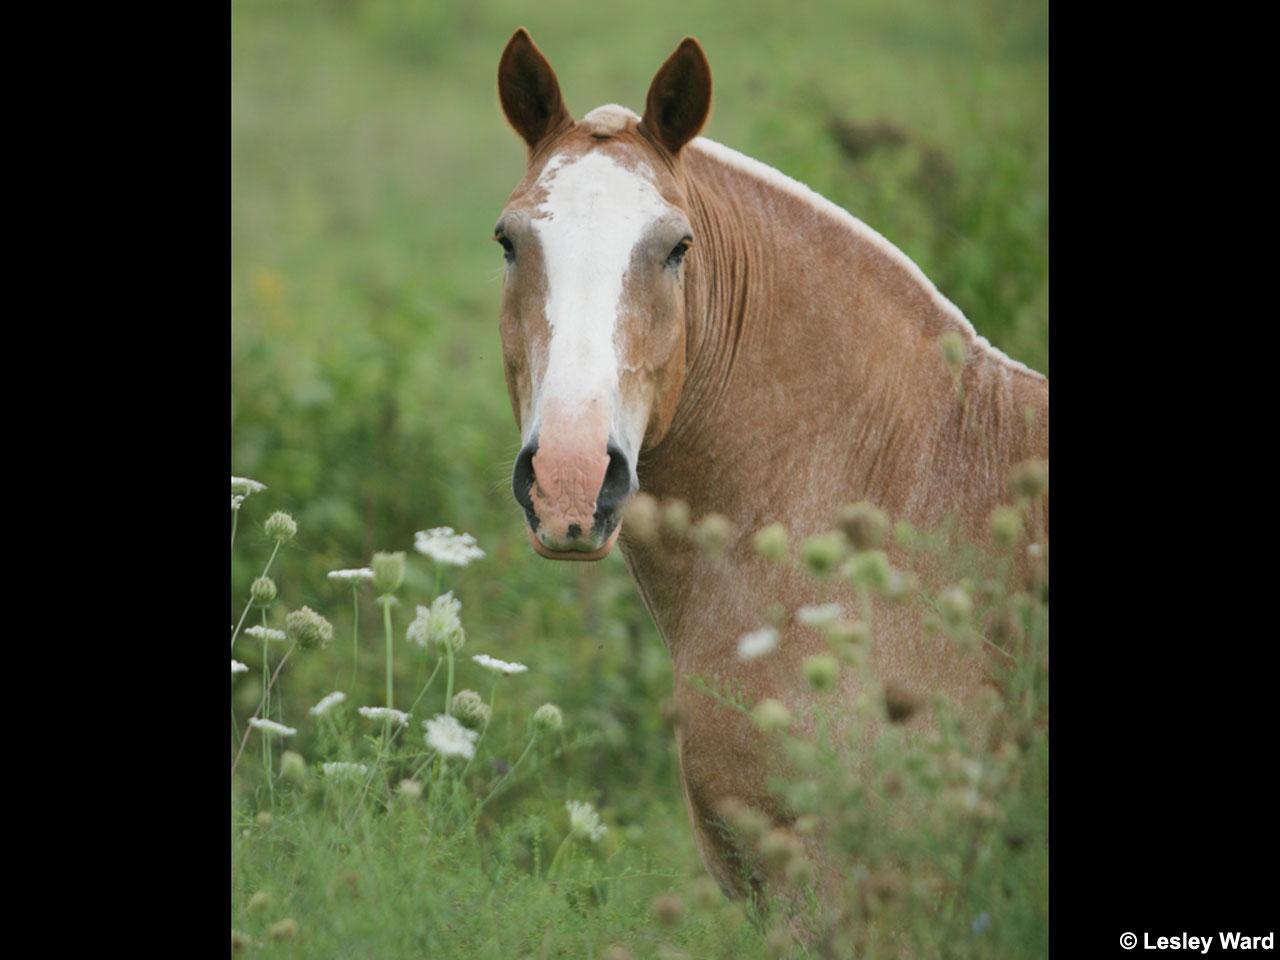 Free horse wallpaper and screensavers wallpapersafari - Free horse backgrounds ...